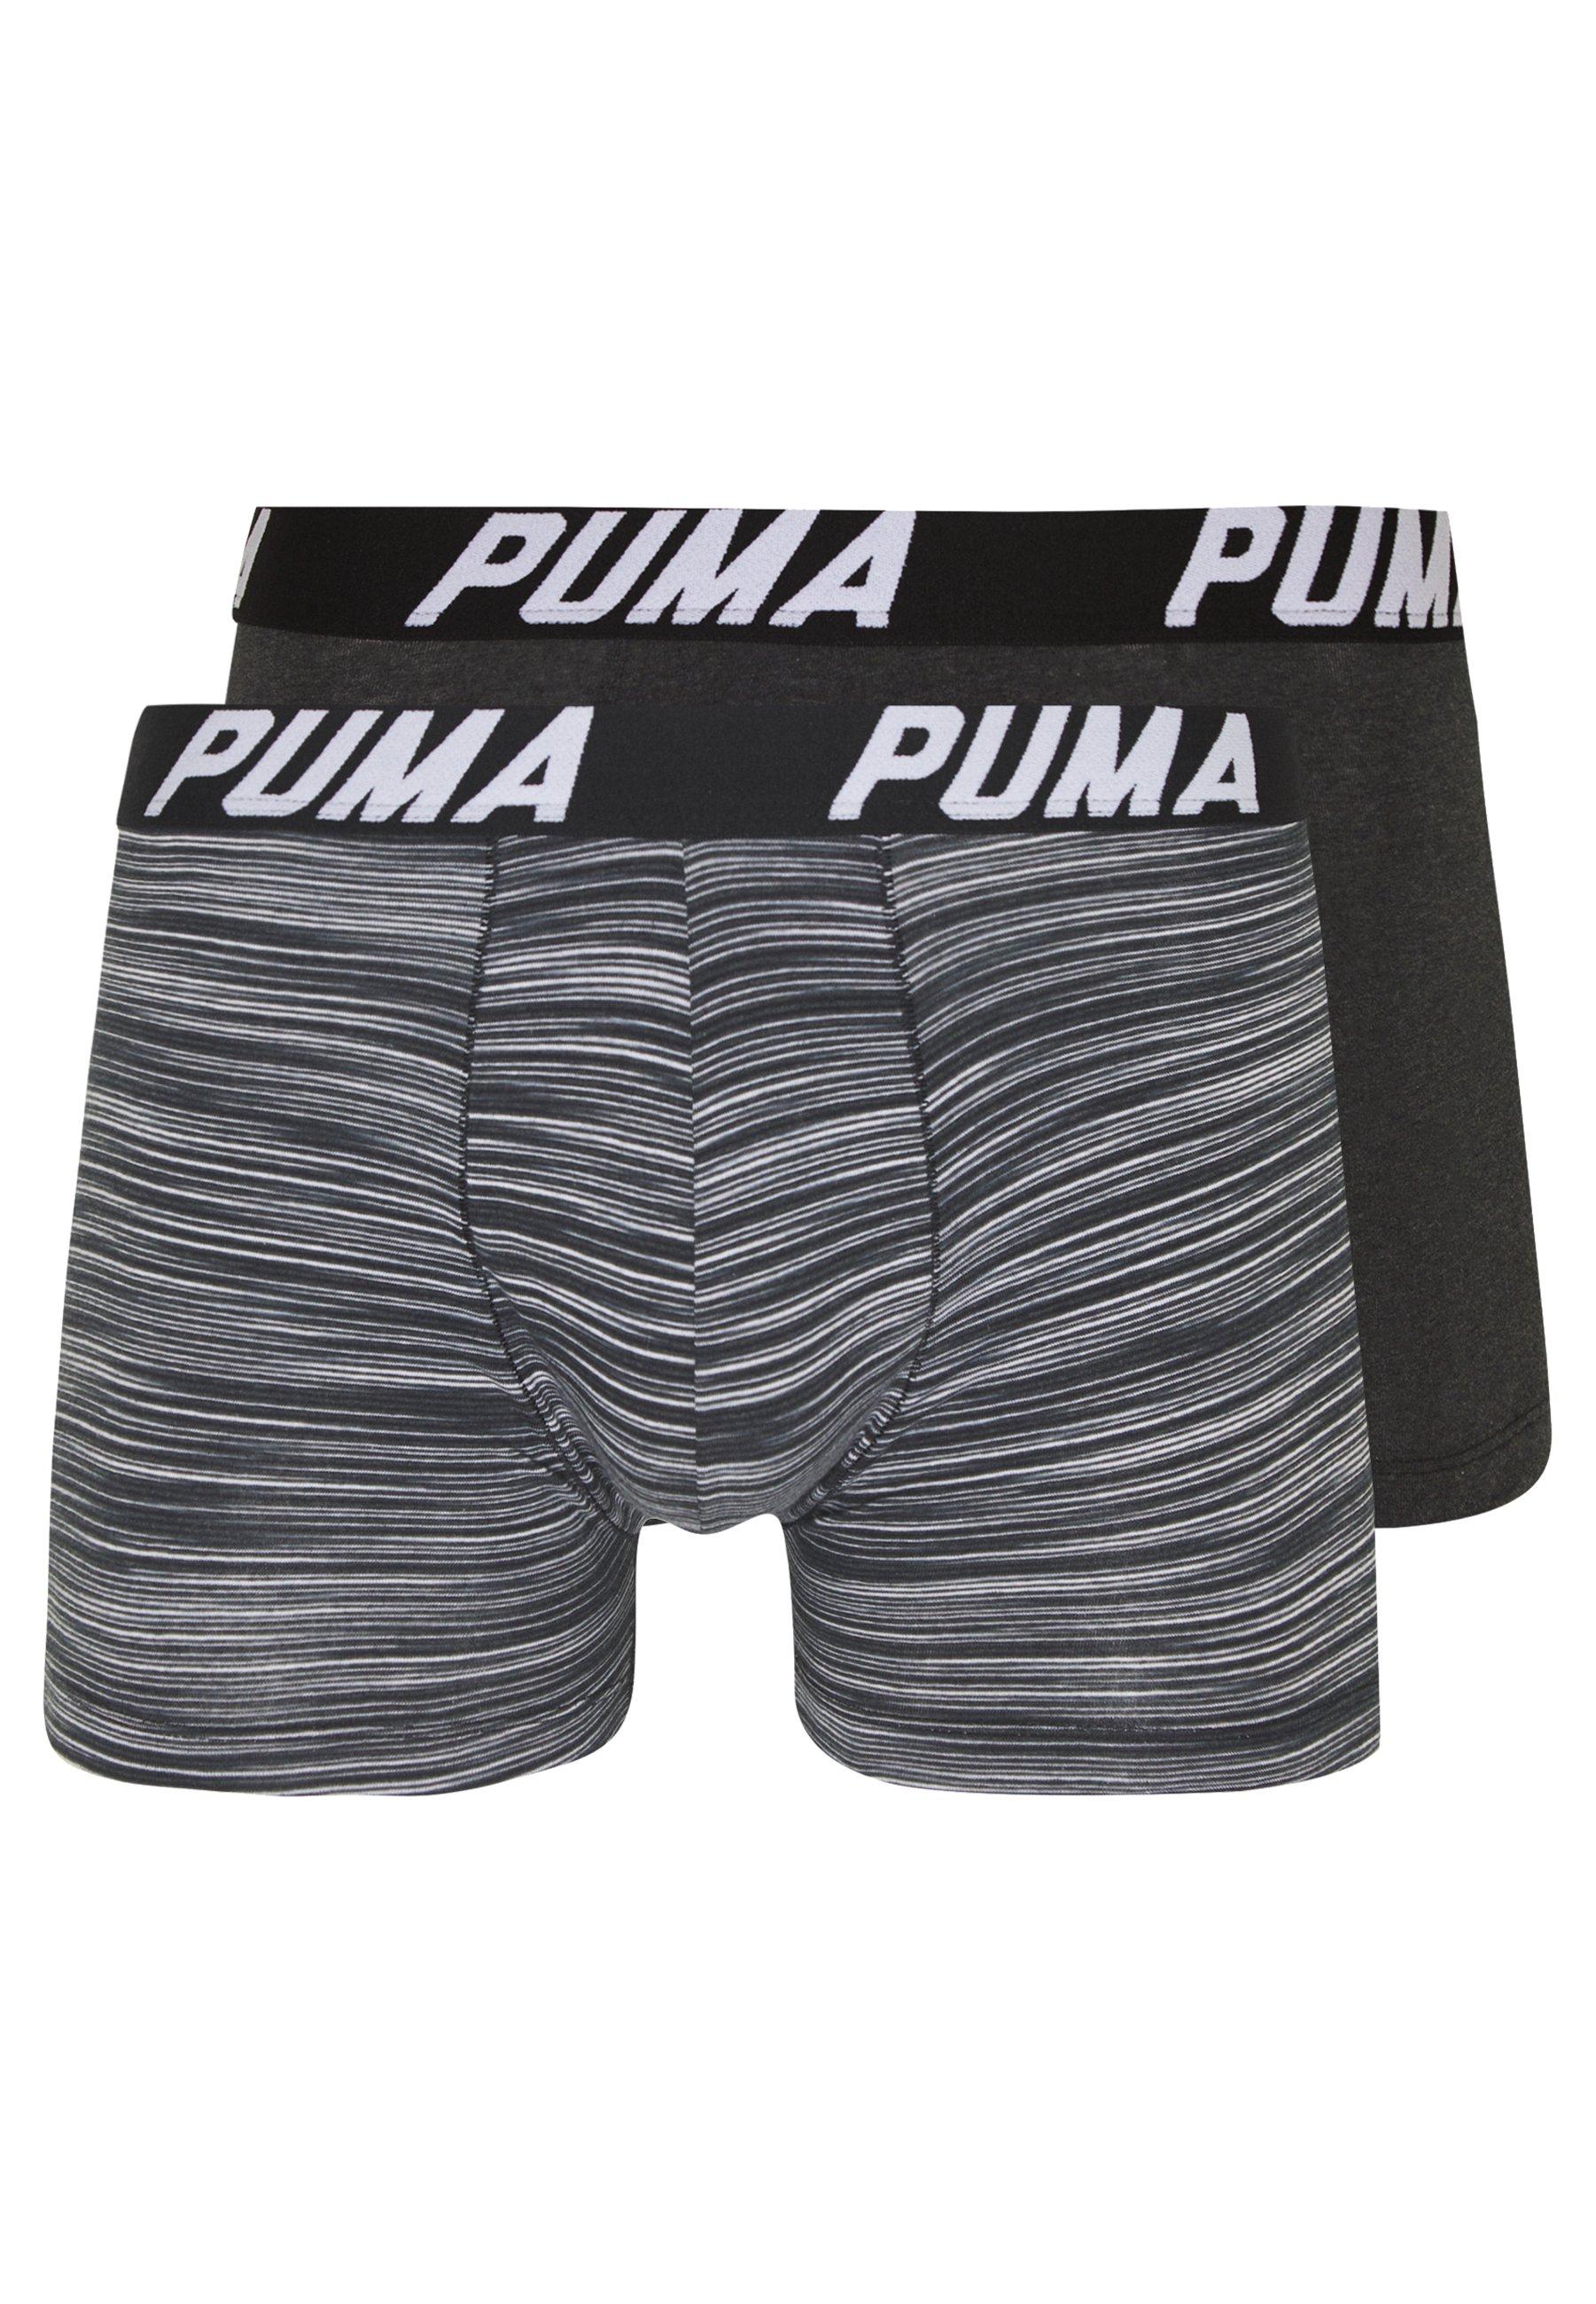 Puma online shop | Gratis verzending | ZALANDO